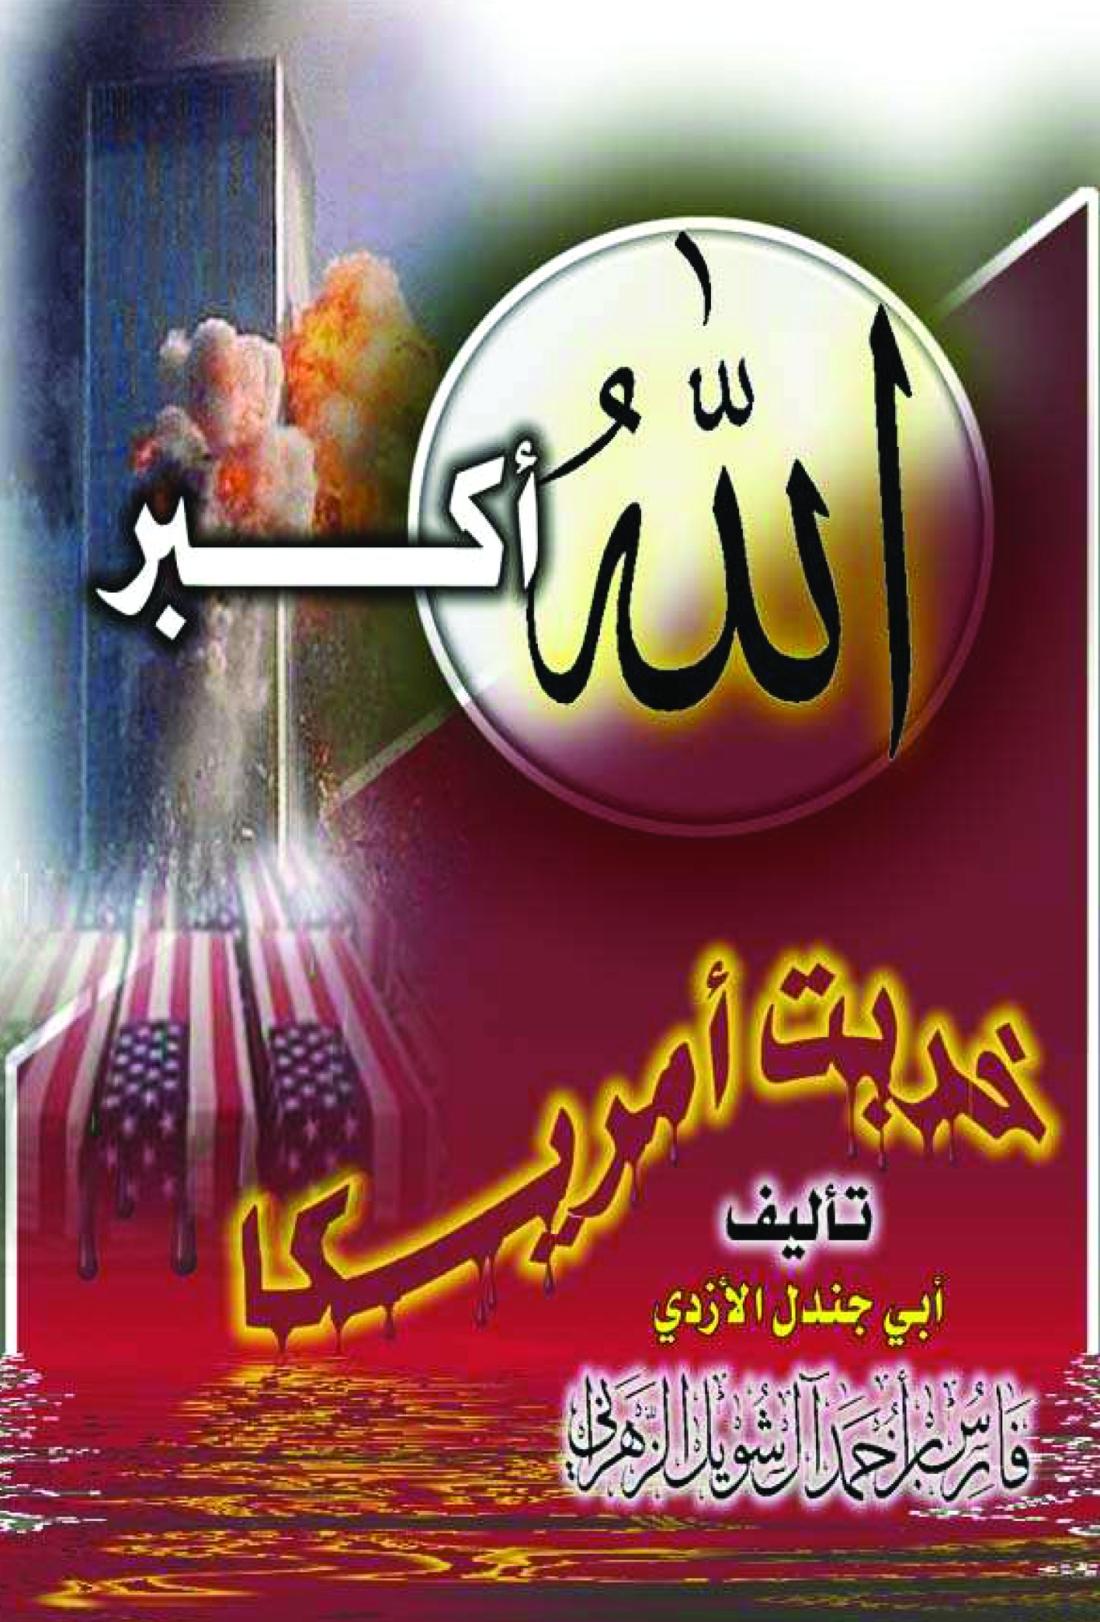 al-azdi america has been devastated Cover